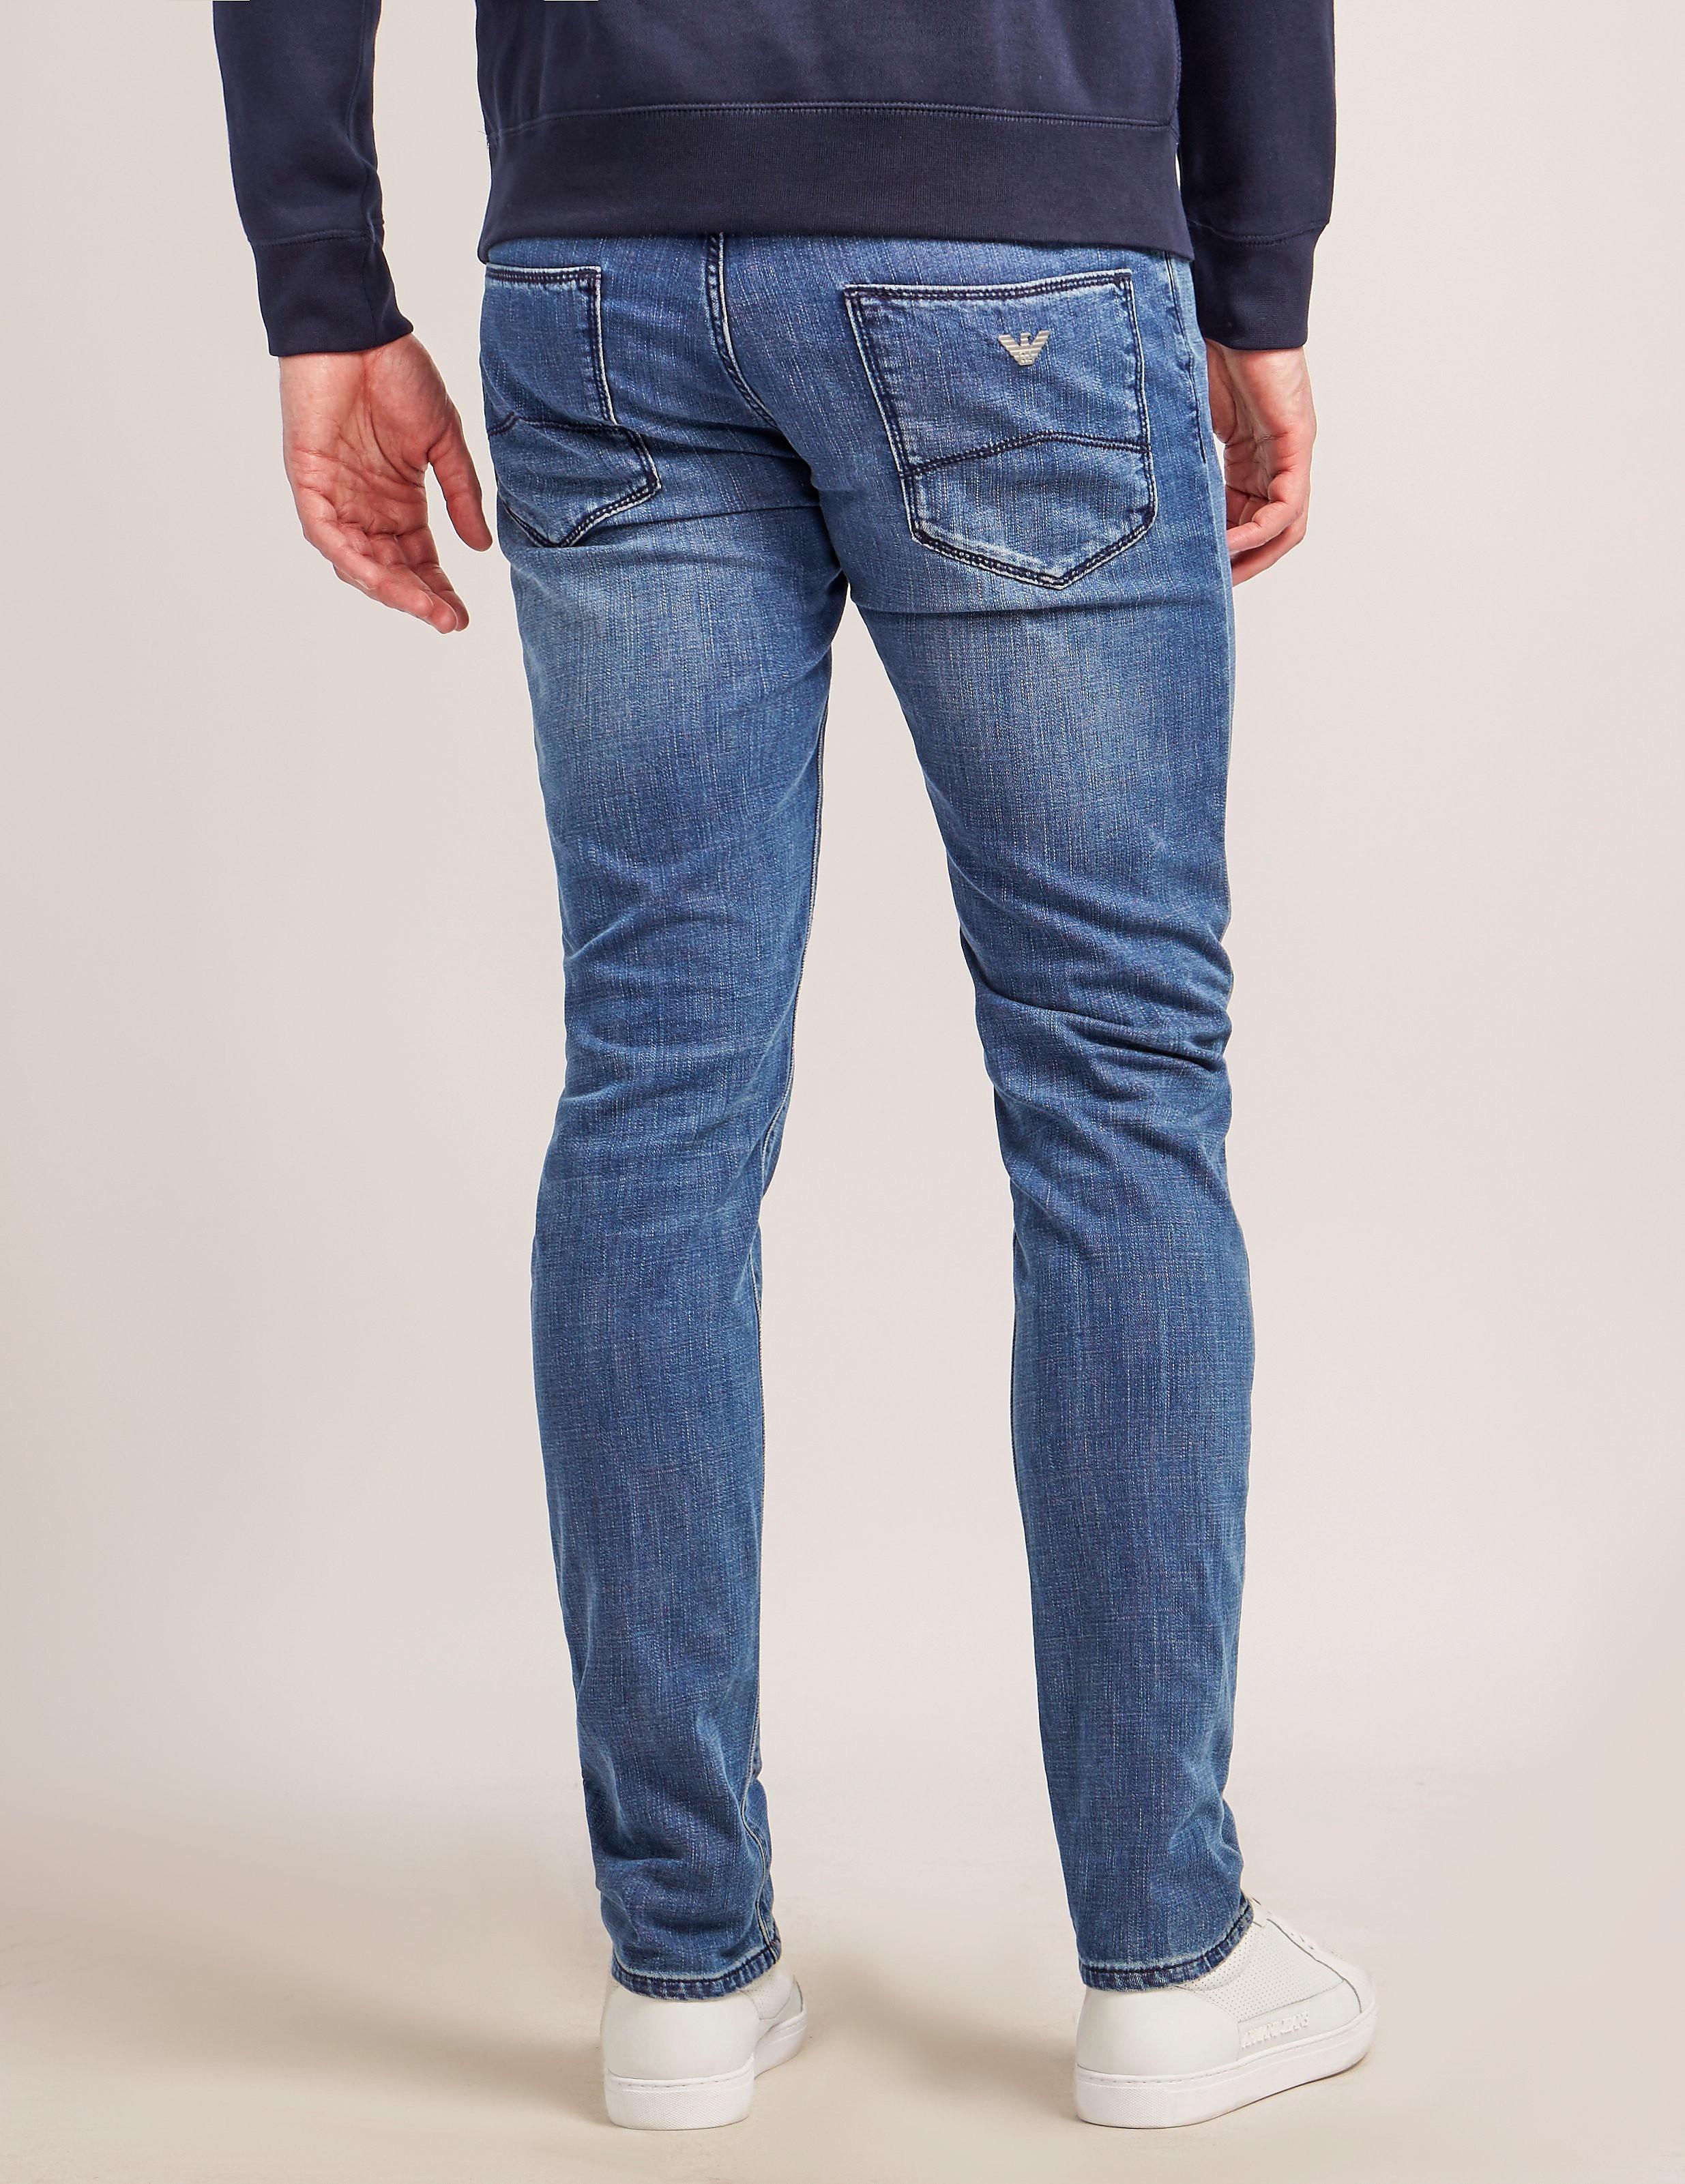 Armani Jeans J06 Slim Fit Jeans - Long